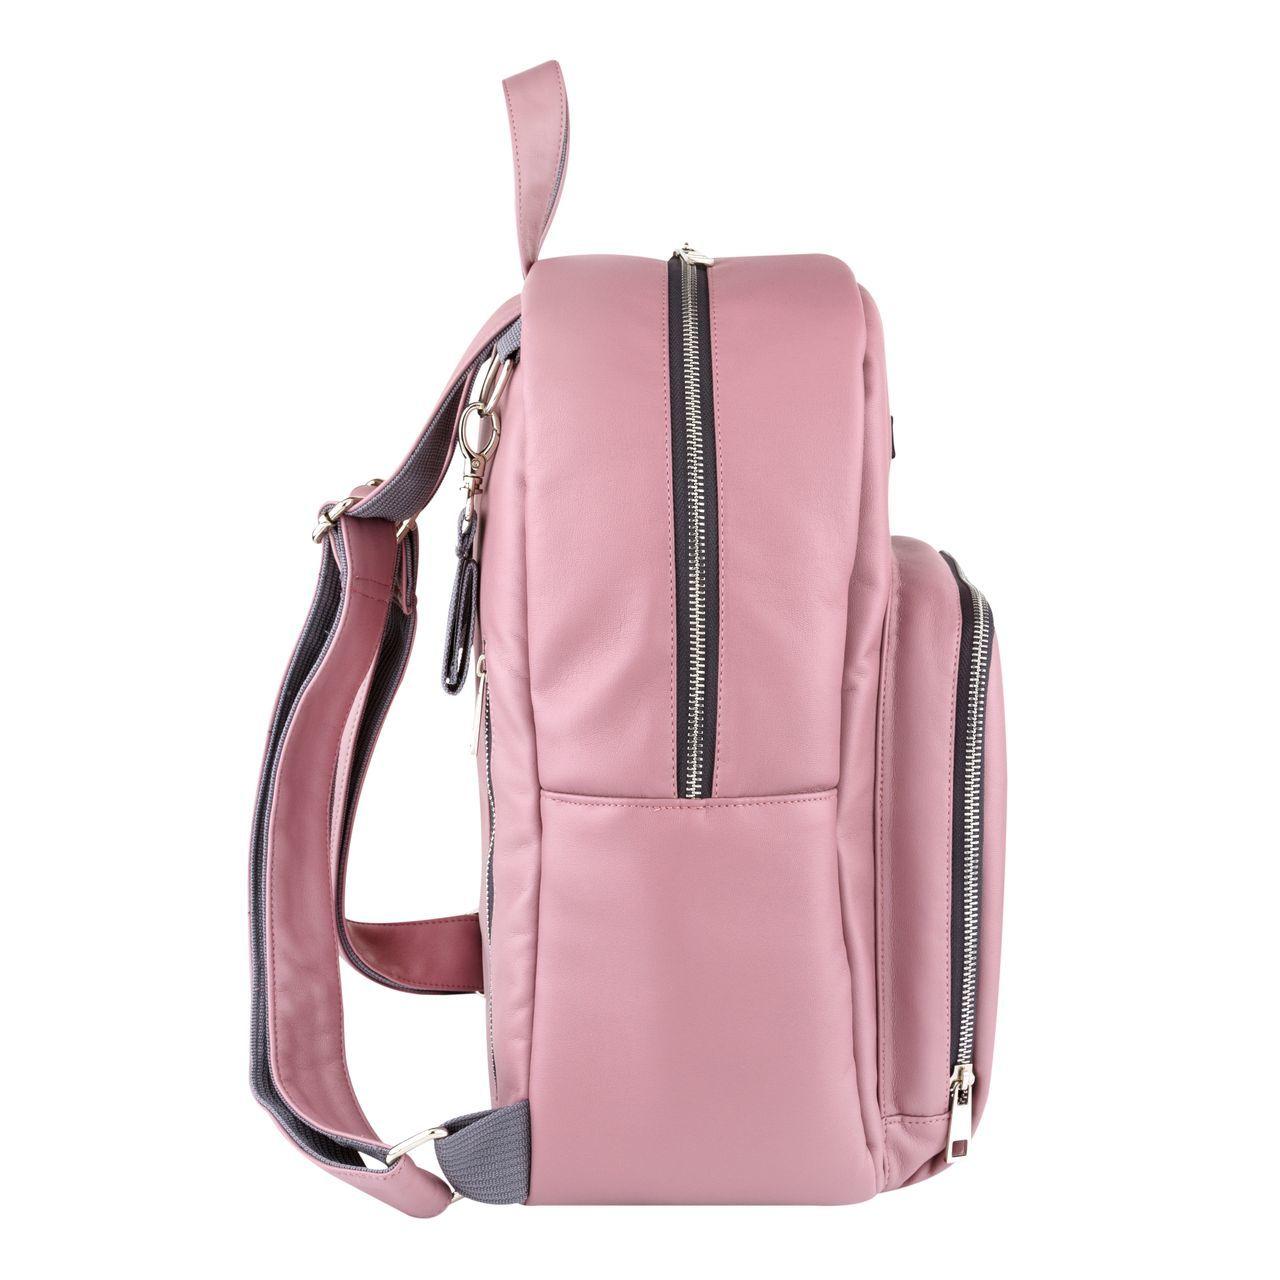 Рюкзак для мамы Chic Lilac